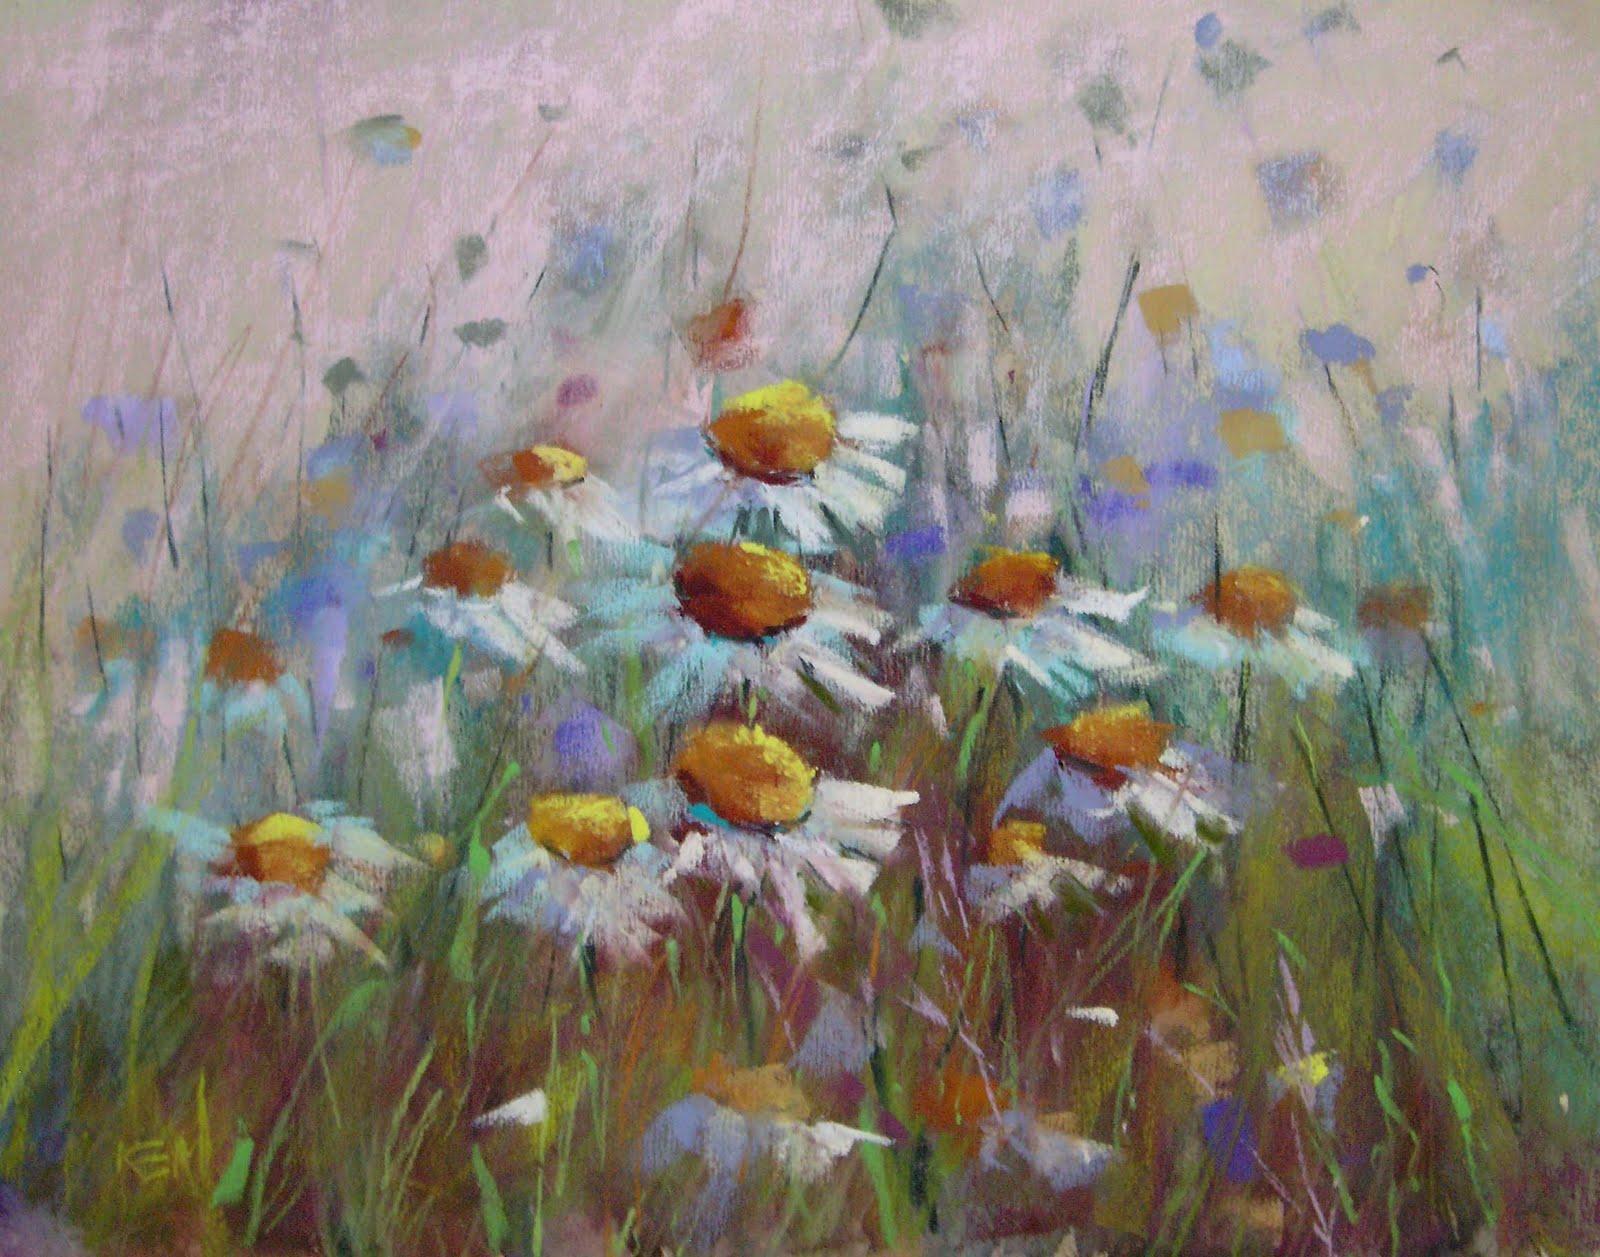 """Nantucket Daisies...my latest wildflower painting"" original fine art by Karen Margulis"